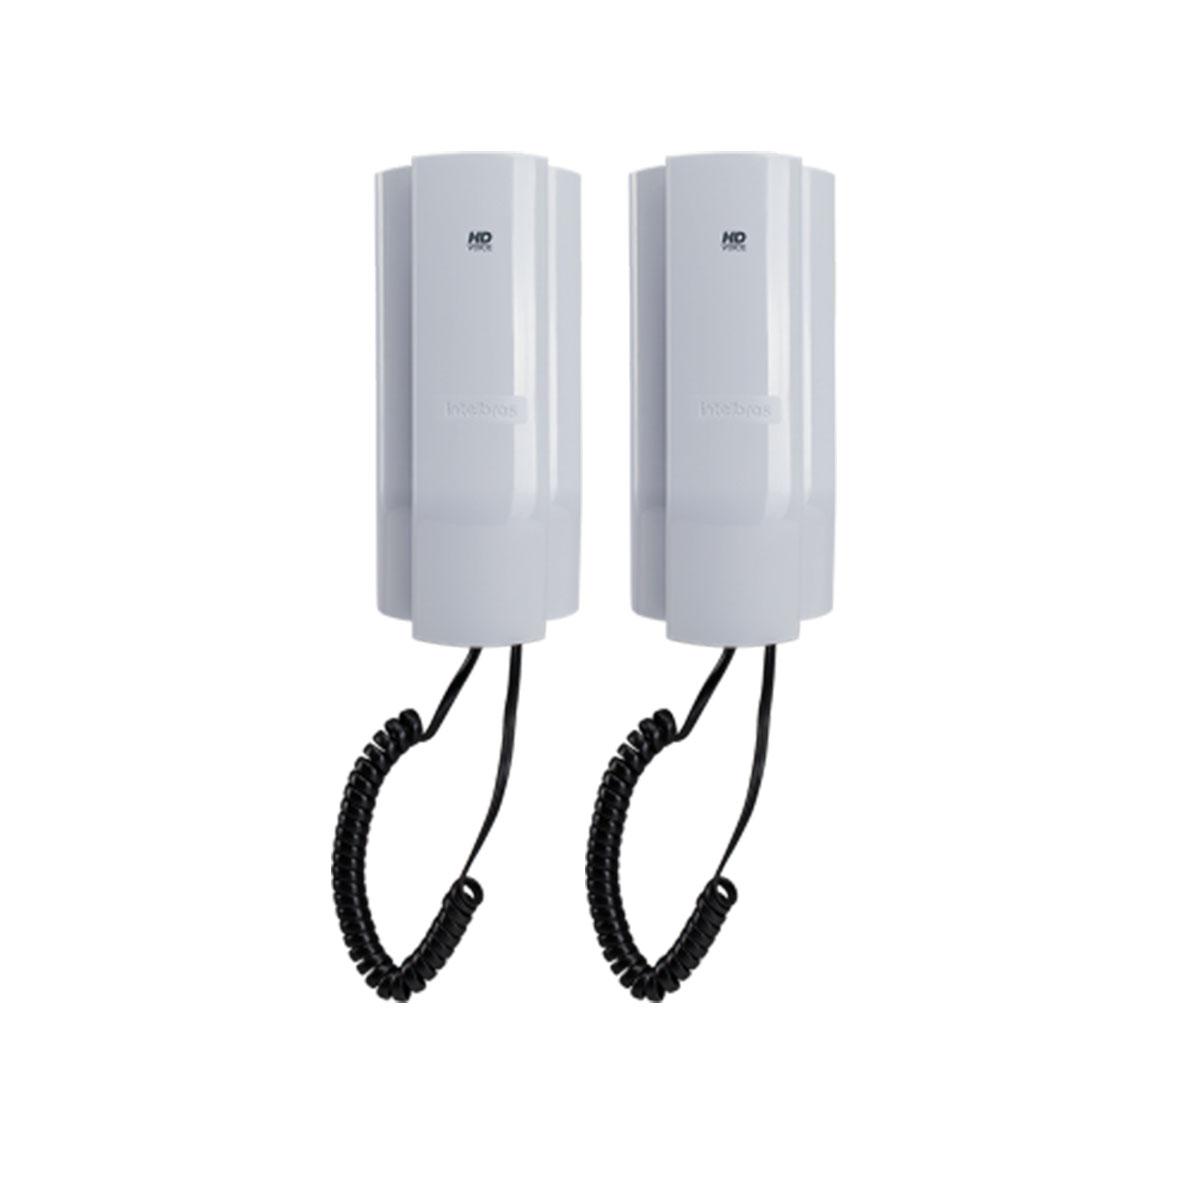 Kit 02 Telefone Intelbras Ip Tdmi 400 Ip Poe